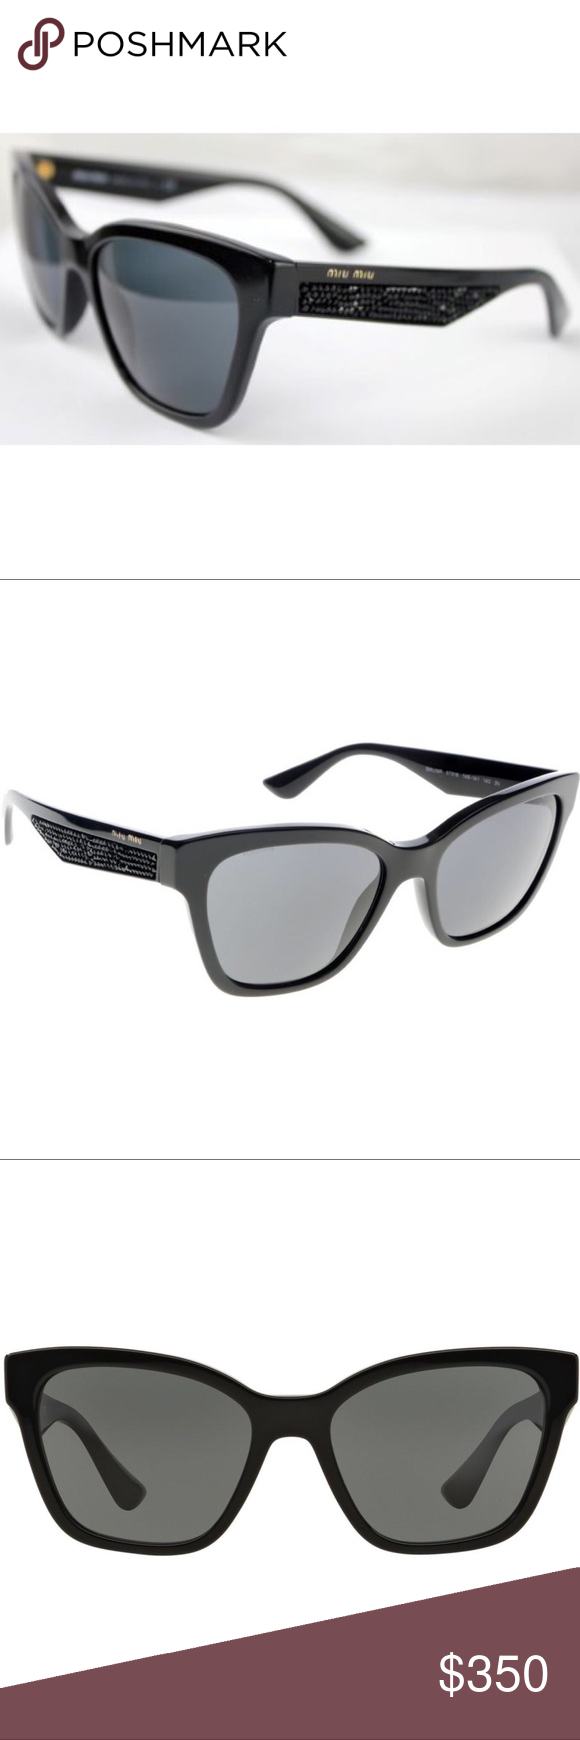 dedeef8947b4 Authentic. Includes  • Original Box • Hard Case • Soft Case (bag) • Lense  Cloth More details and photos to follow Miu Miu Accessories Sunglasses